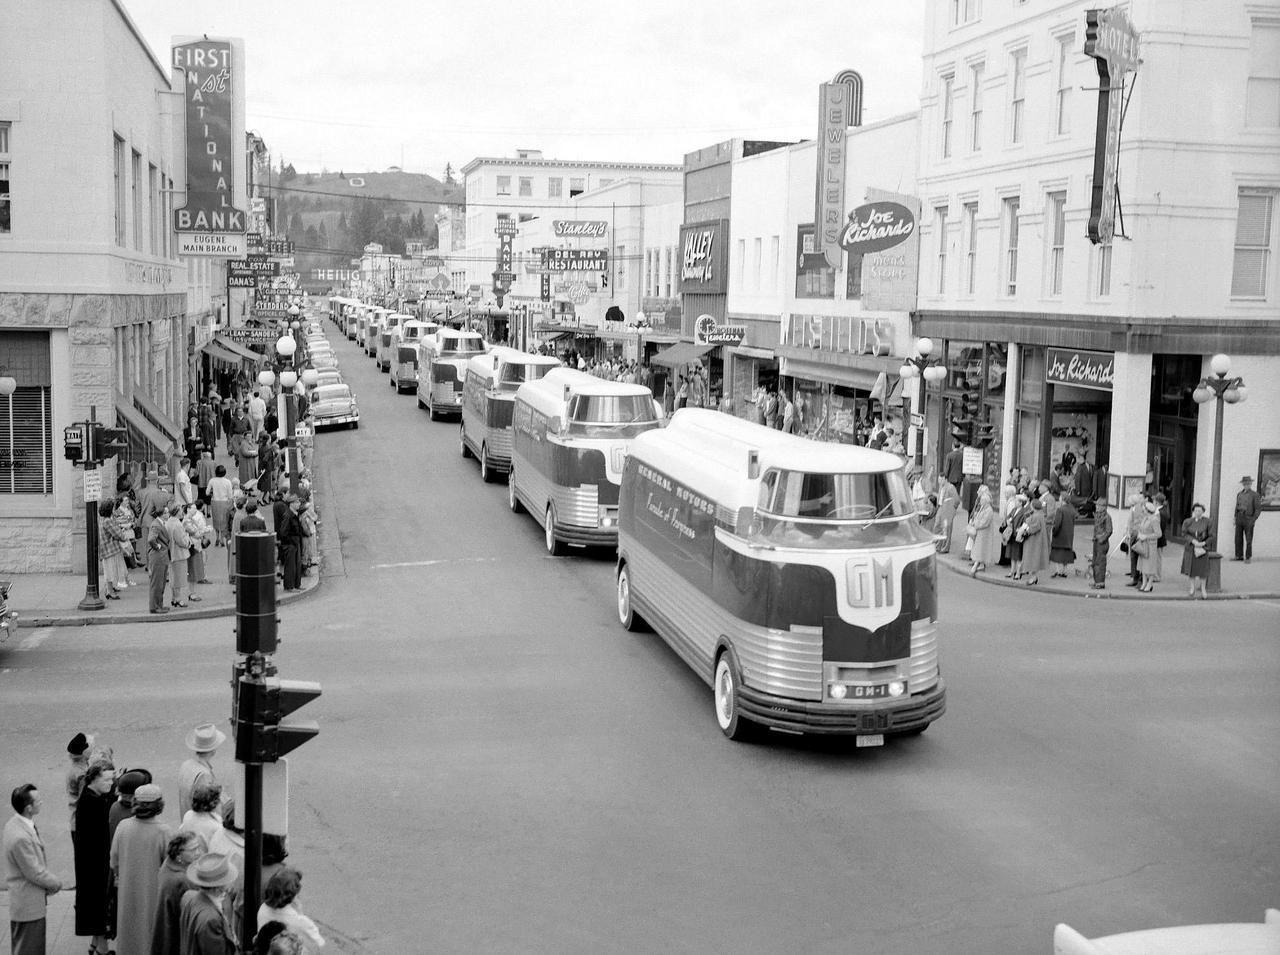 Aiiaiiiyo General Motors Futurliner Bus Parade Of Progress 1939 1984x1480 Check This Blog Concept Cars Vintage General Motors Panel Truck